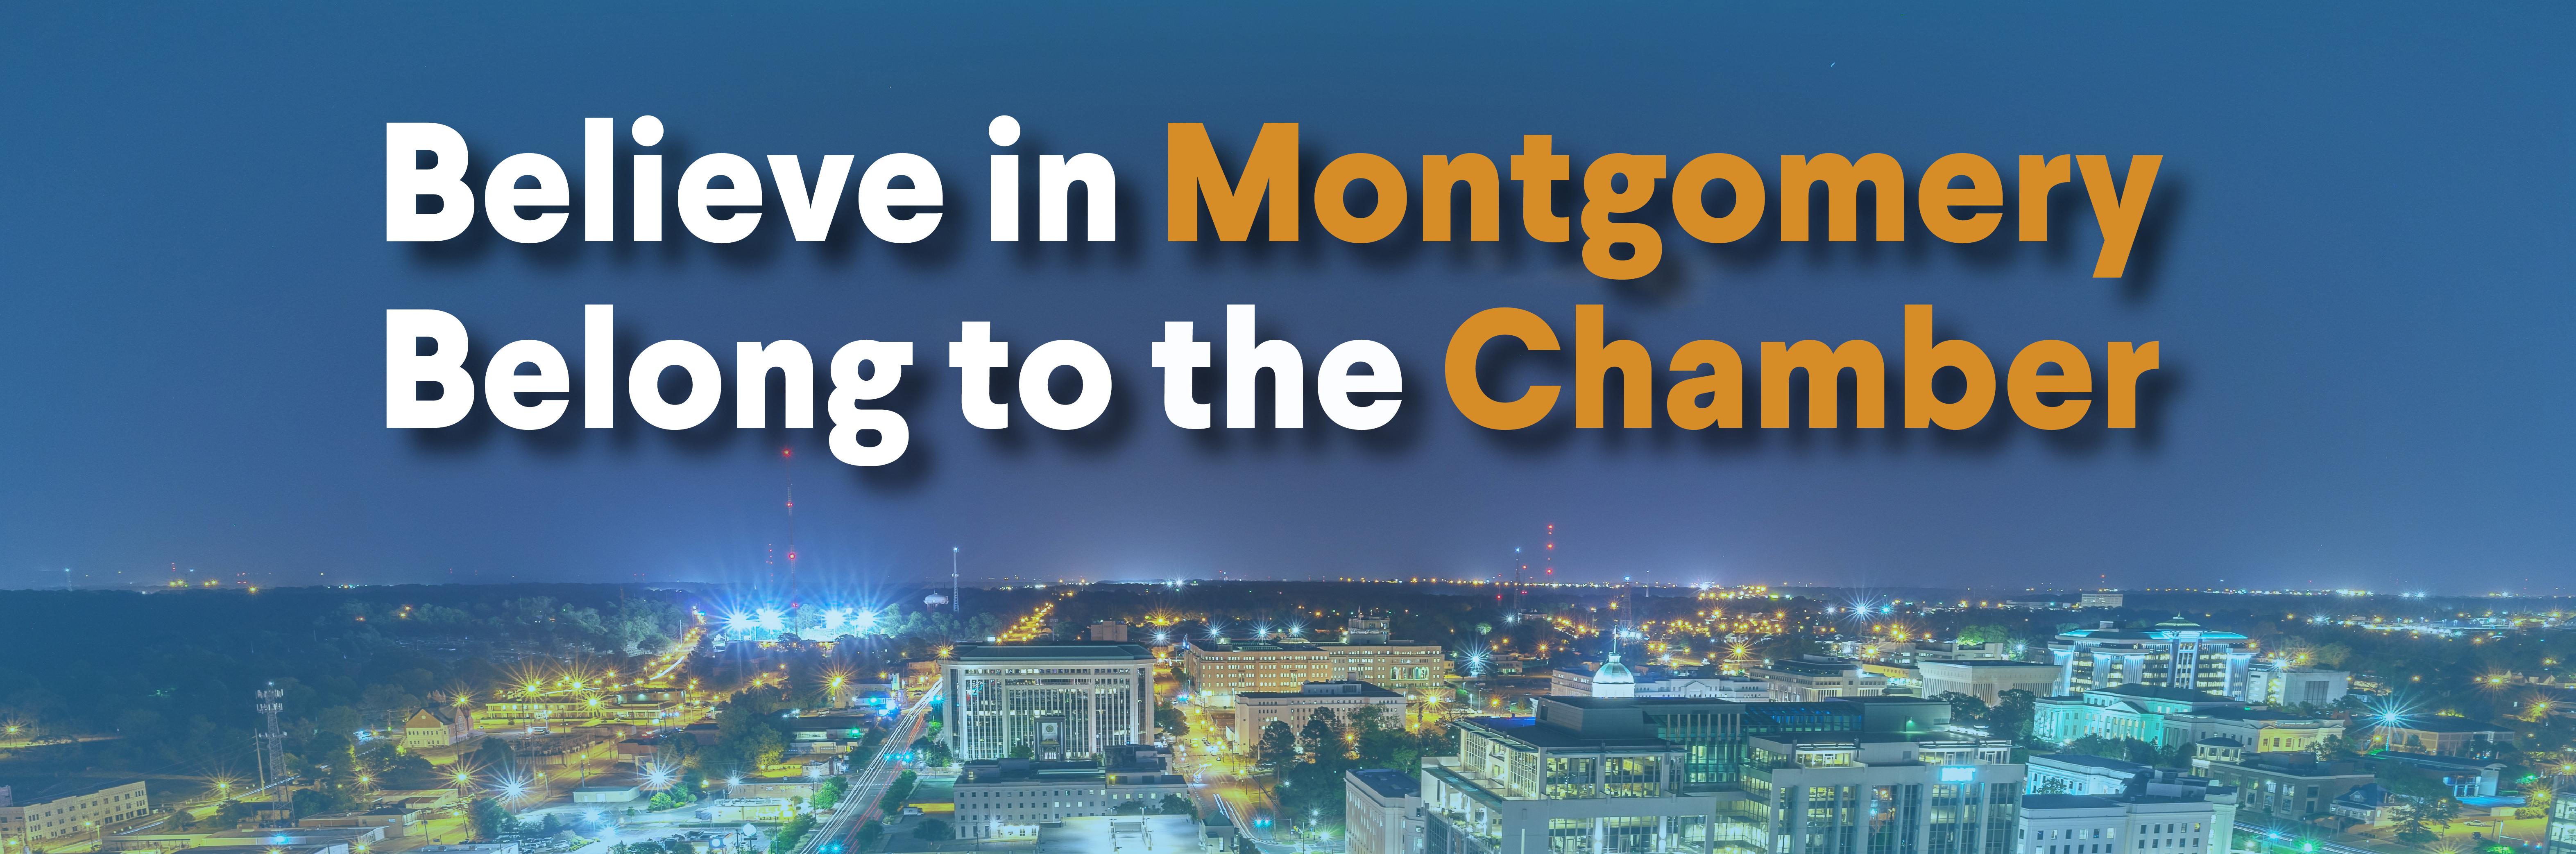 Montgomery Area Chamber of Commerce, Montgomery Chamber. MGMChamber, Montgomery Alabama